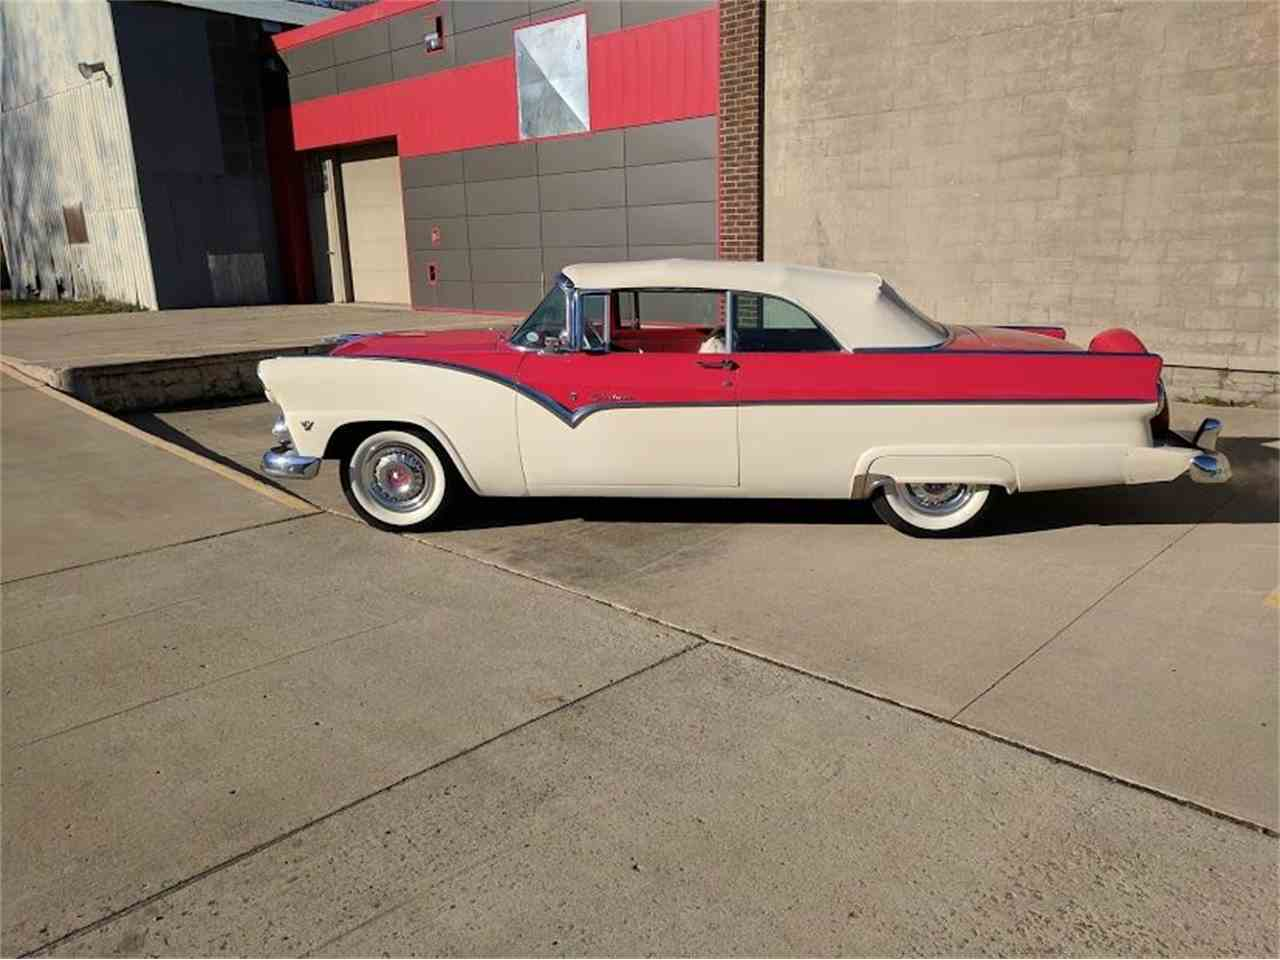 1955 ford fairlane sunliner for sale classiccars cc 1040421 large picture of classic 1955 fairlane sunliner auction vehicle masl altavistaventures Gallery